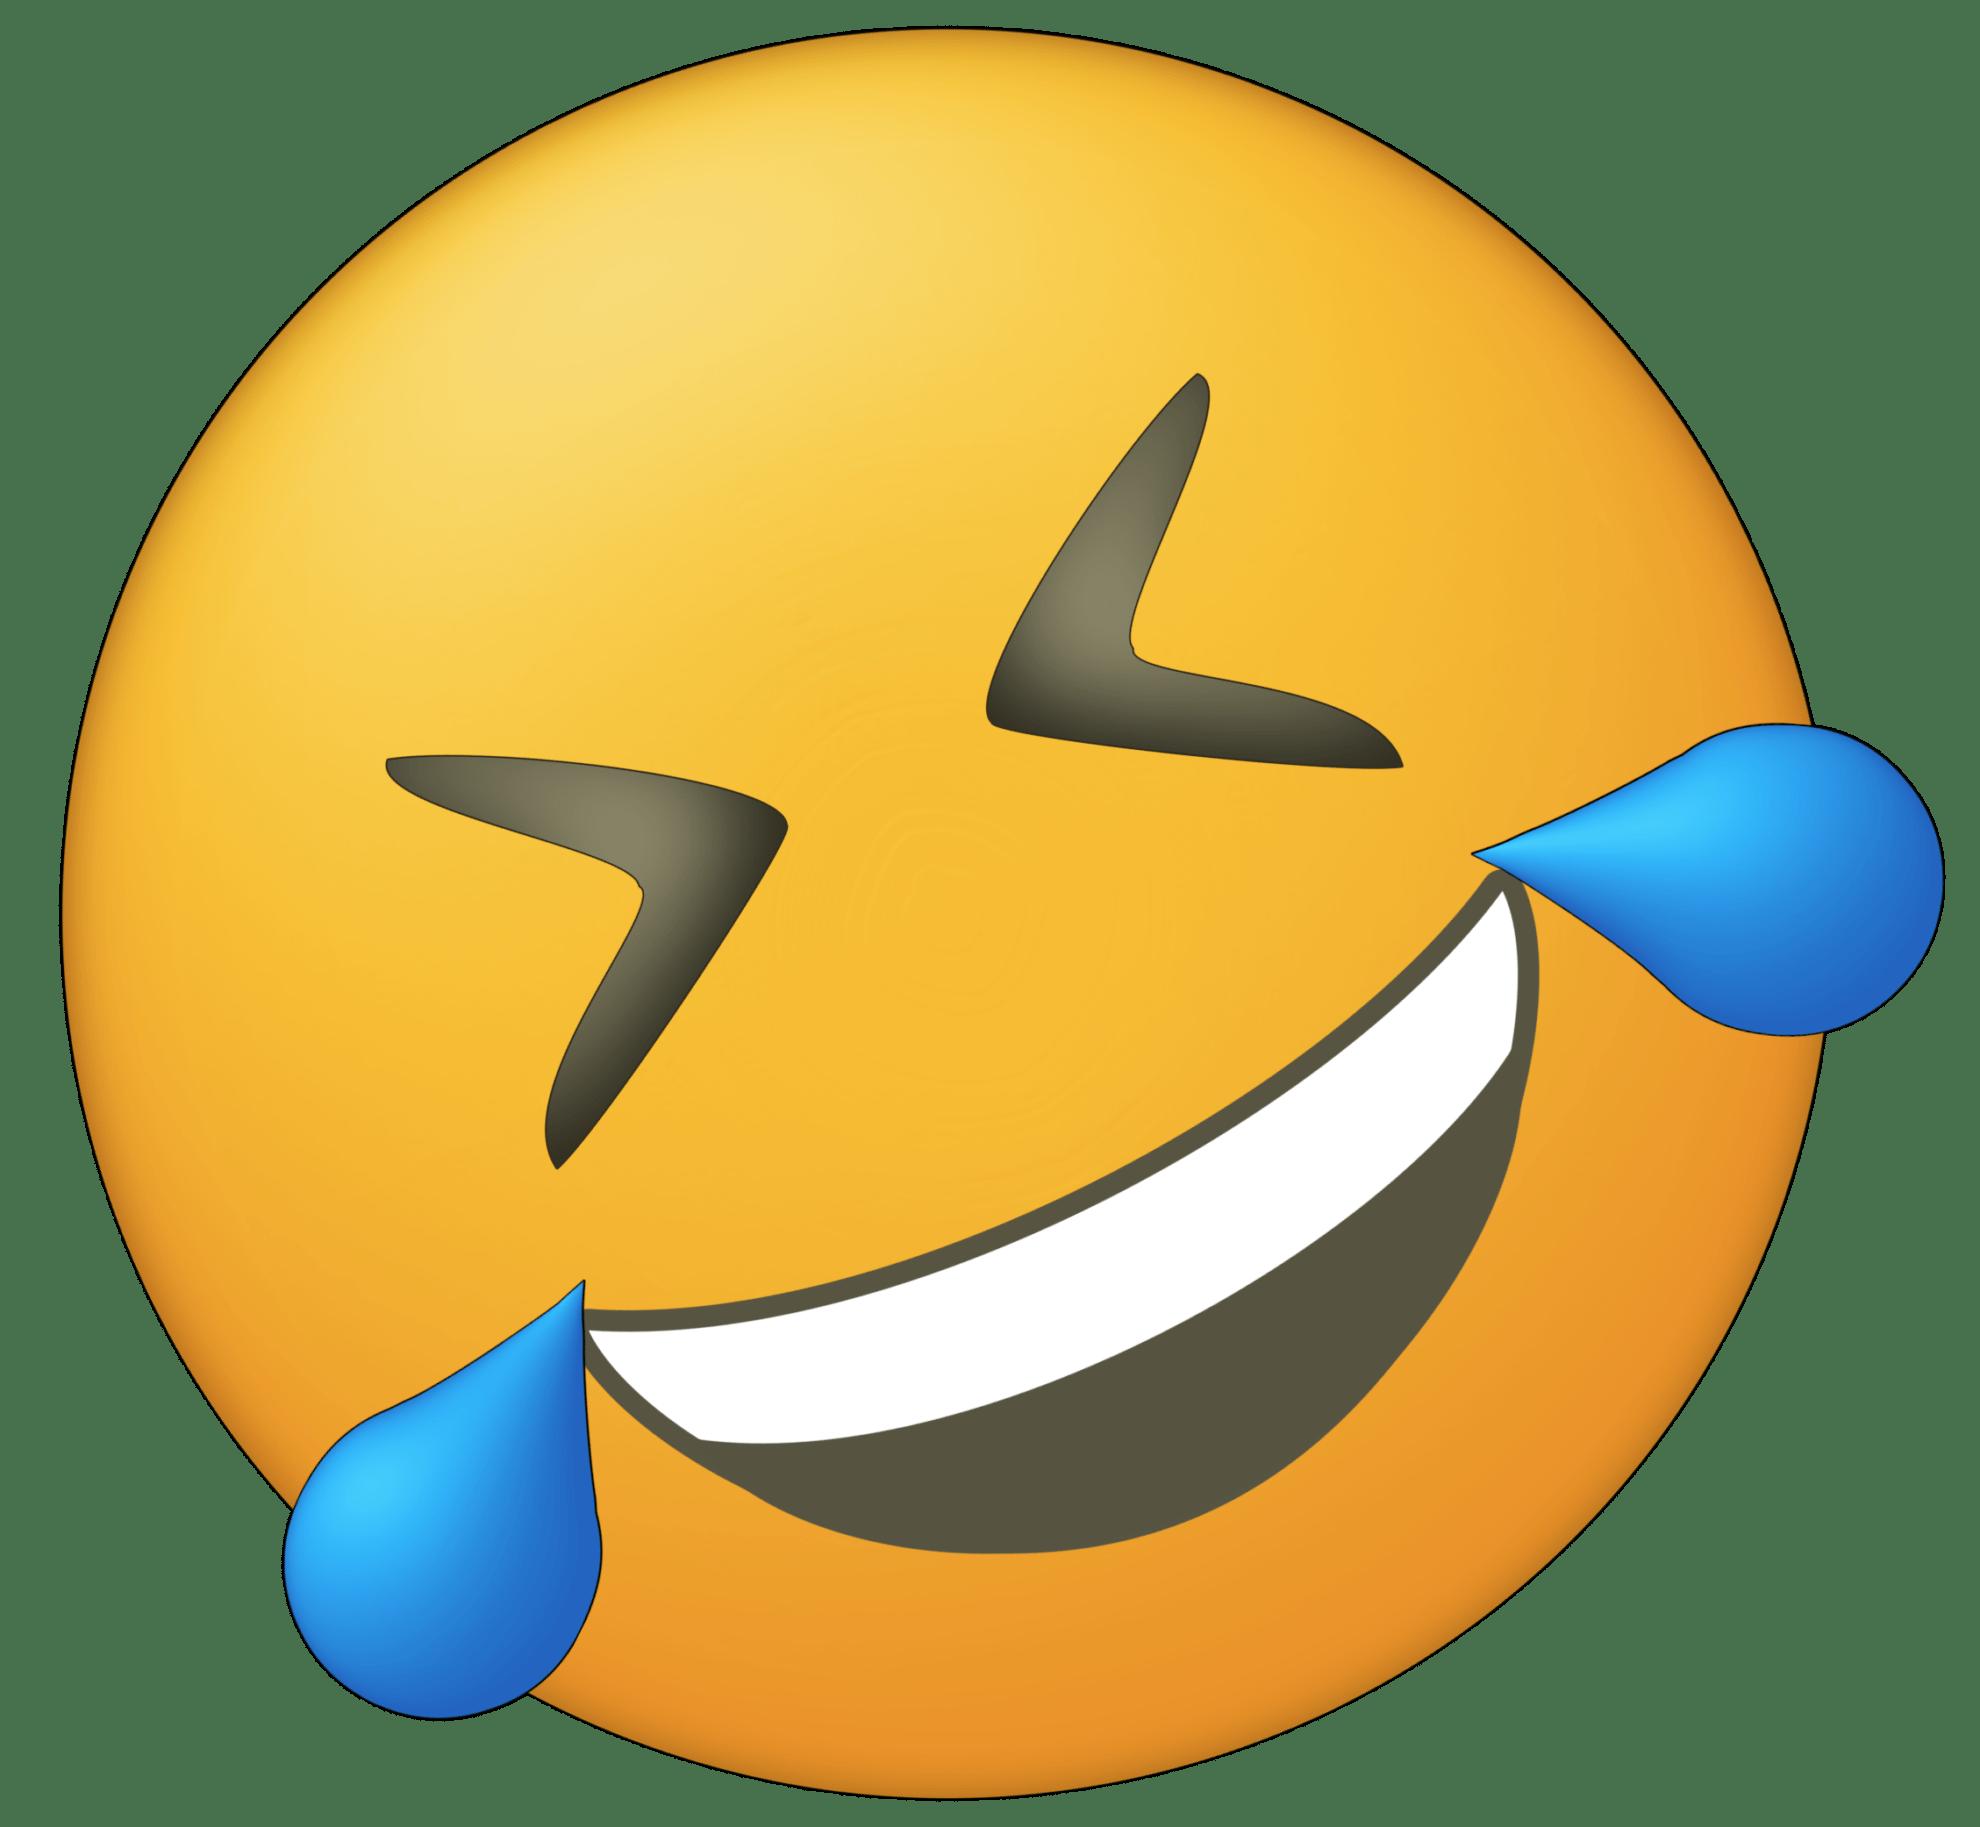 photo relating to Emoji Printable Faces identified as Emoji Faces Printable No cost Emoji Printables - Paper Path